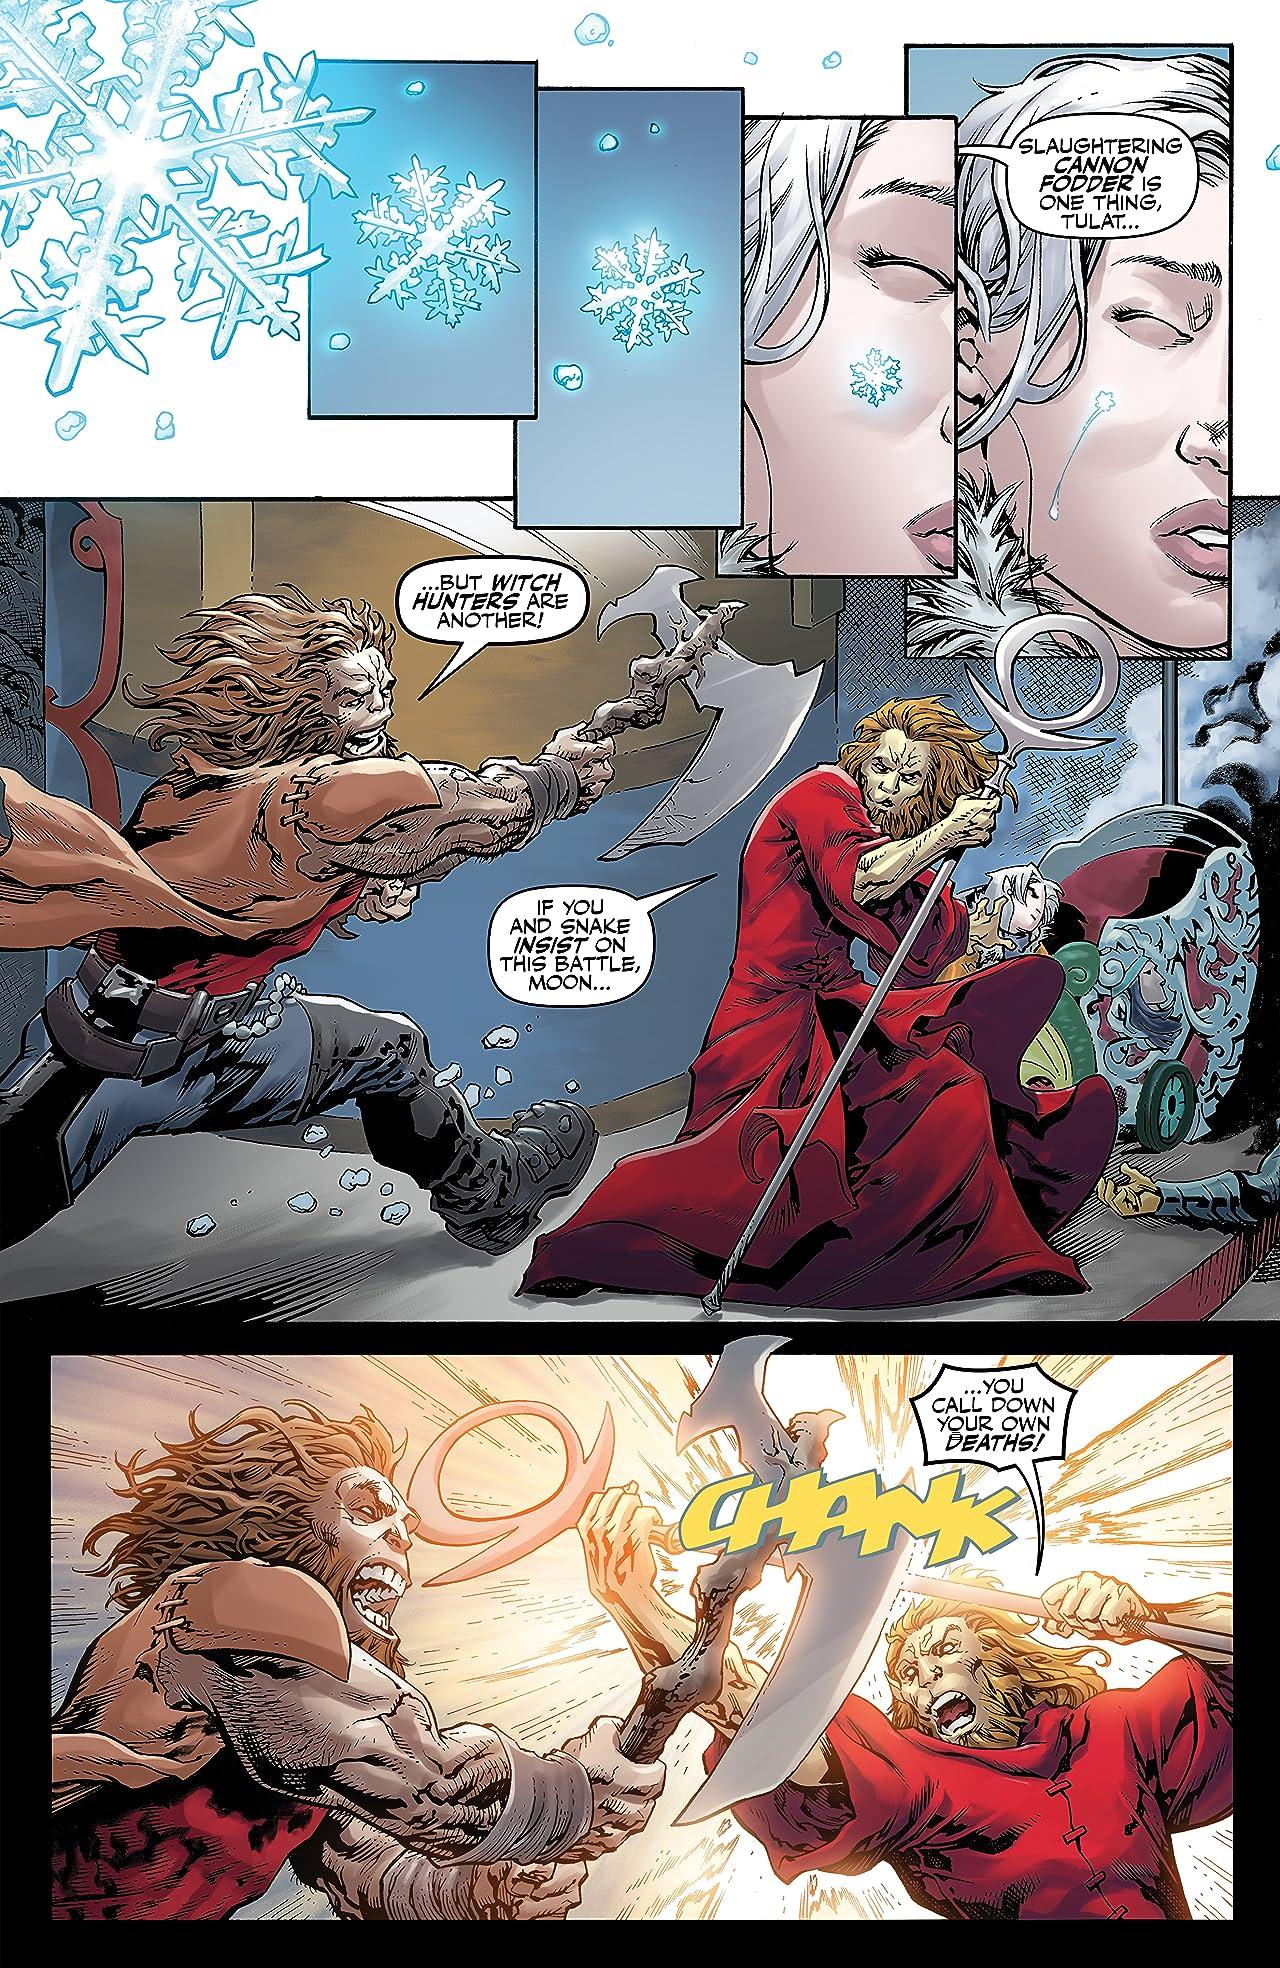 Legendary: Death of Pheros No.4